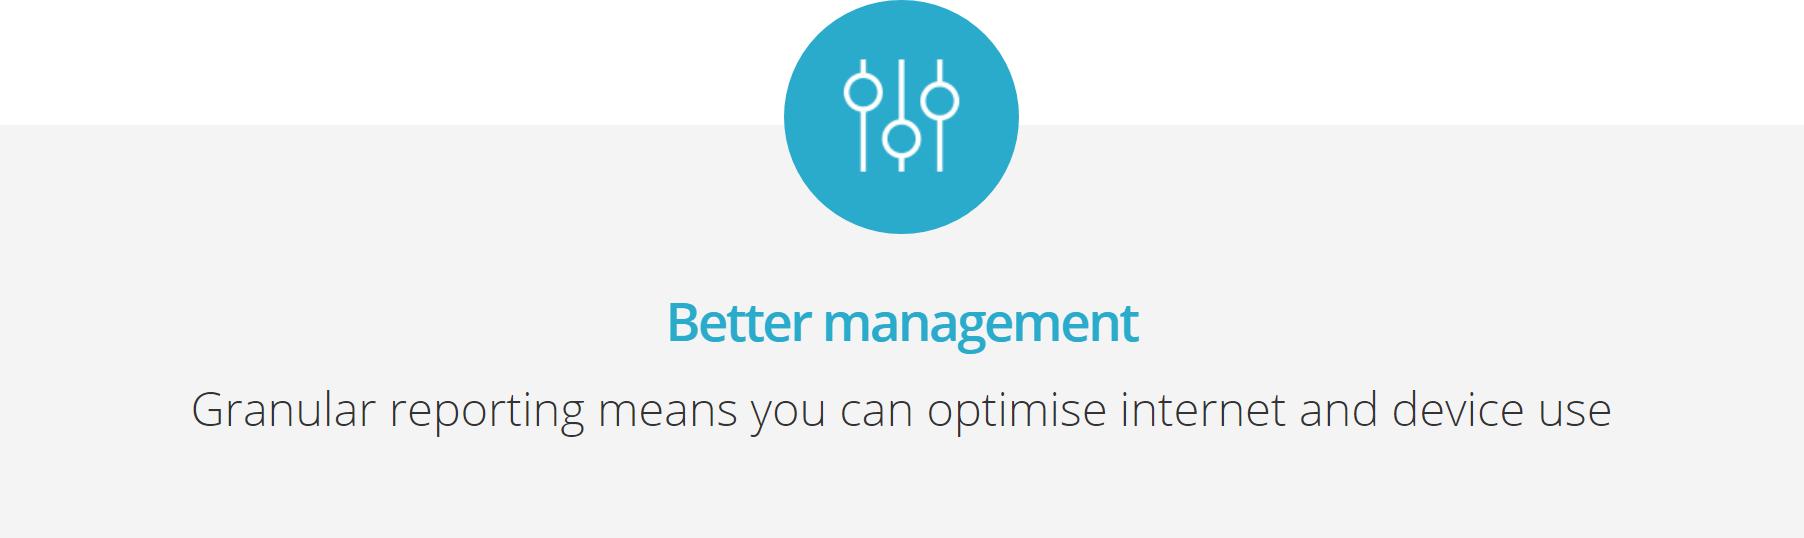 Qustodio Better Management 2